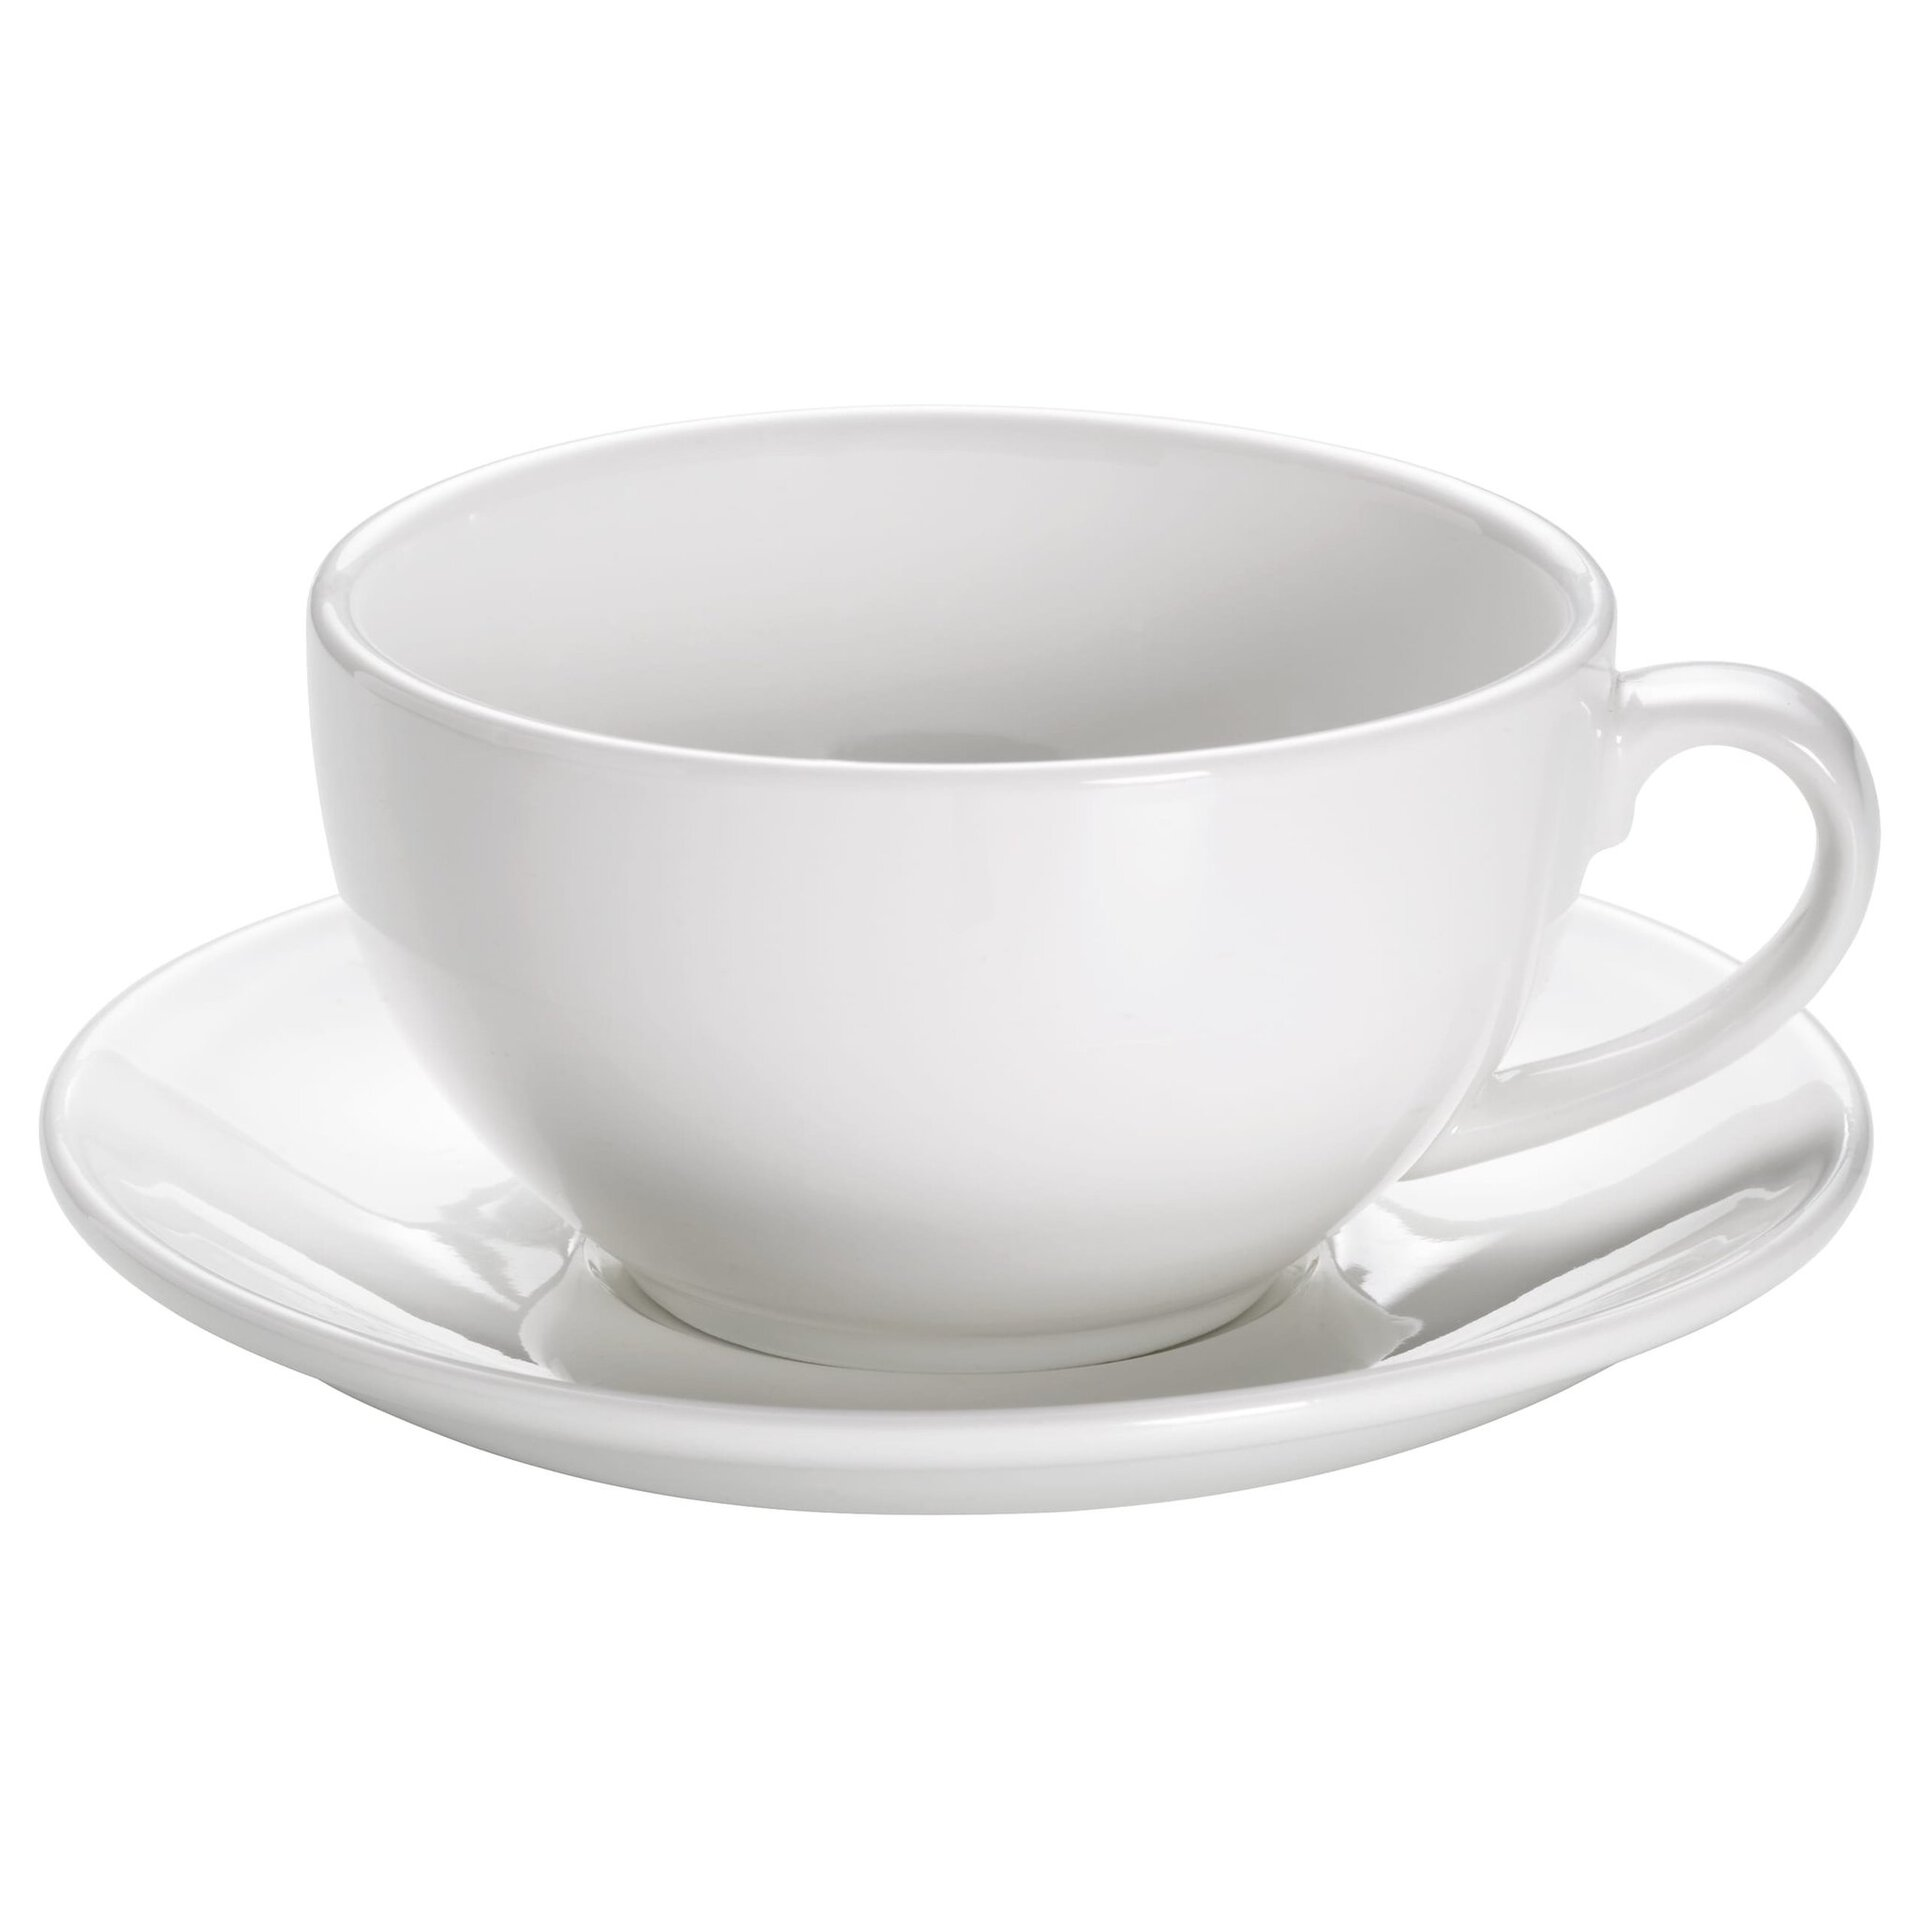 Tasse White Basics Maxwell & Williams Keramik